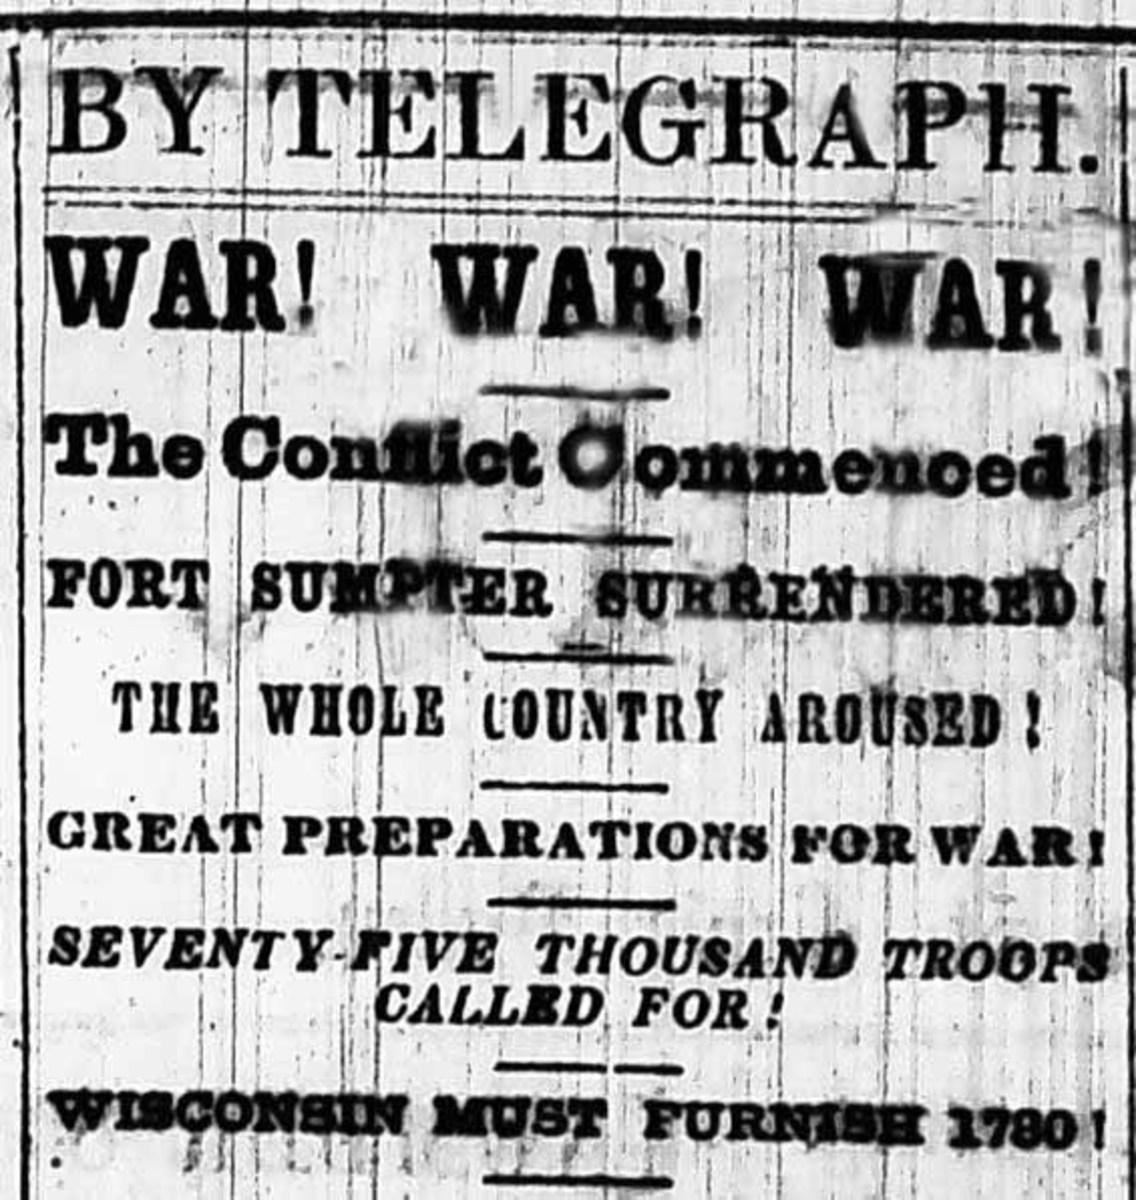 Wisconsin Newspaper, April 1861